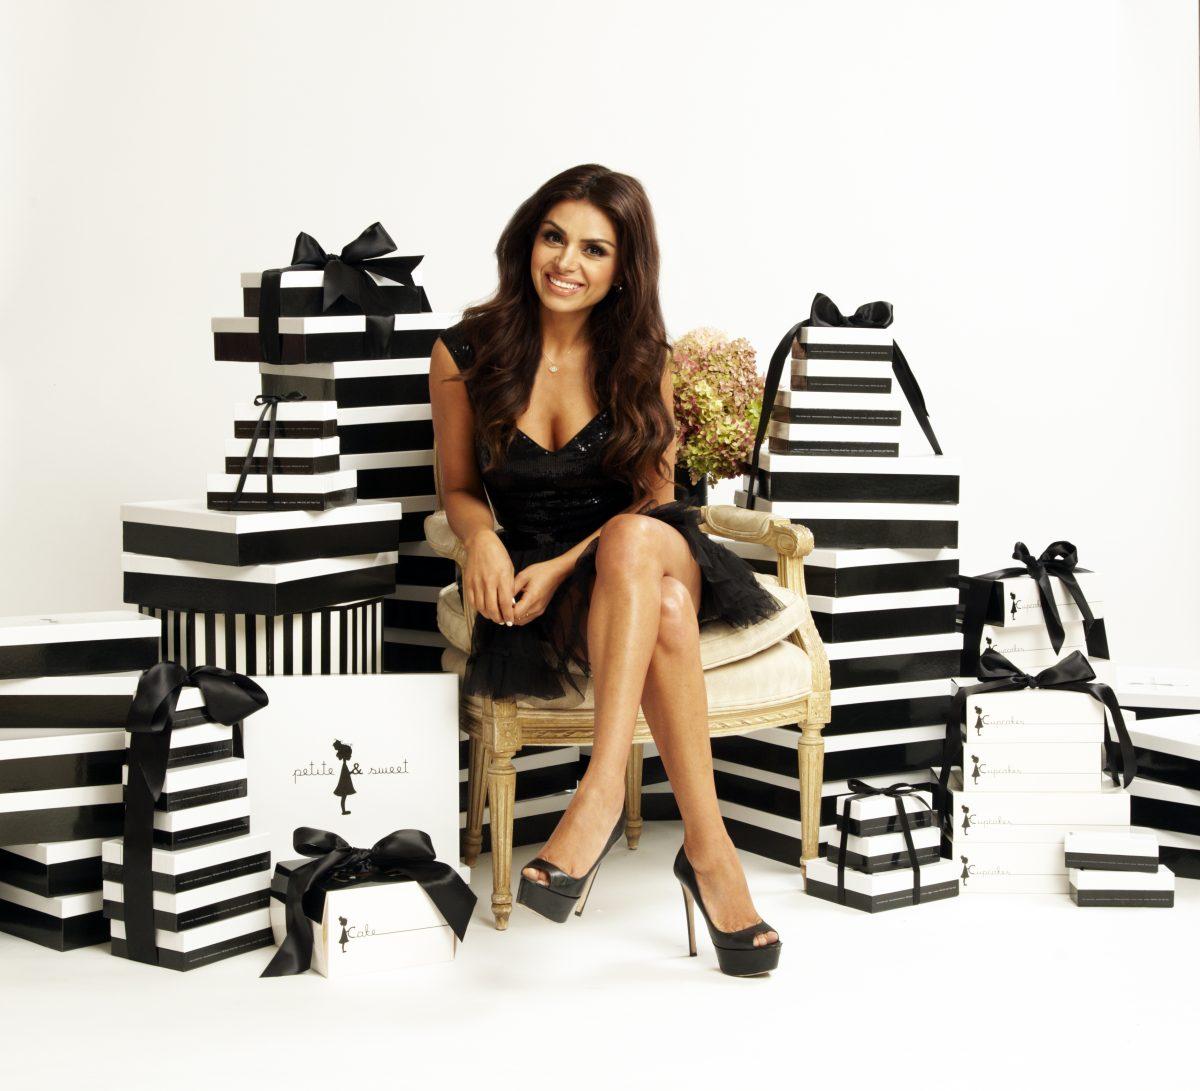 Elle-gift-boxes-brand-book-1200x1091.jpg